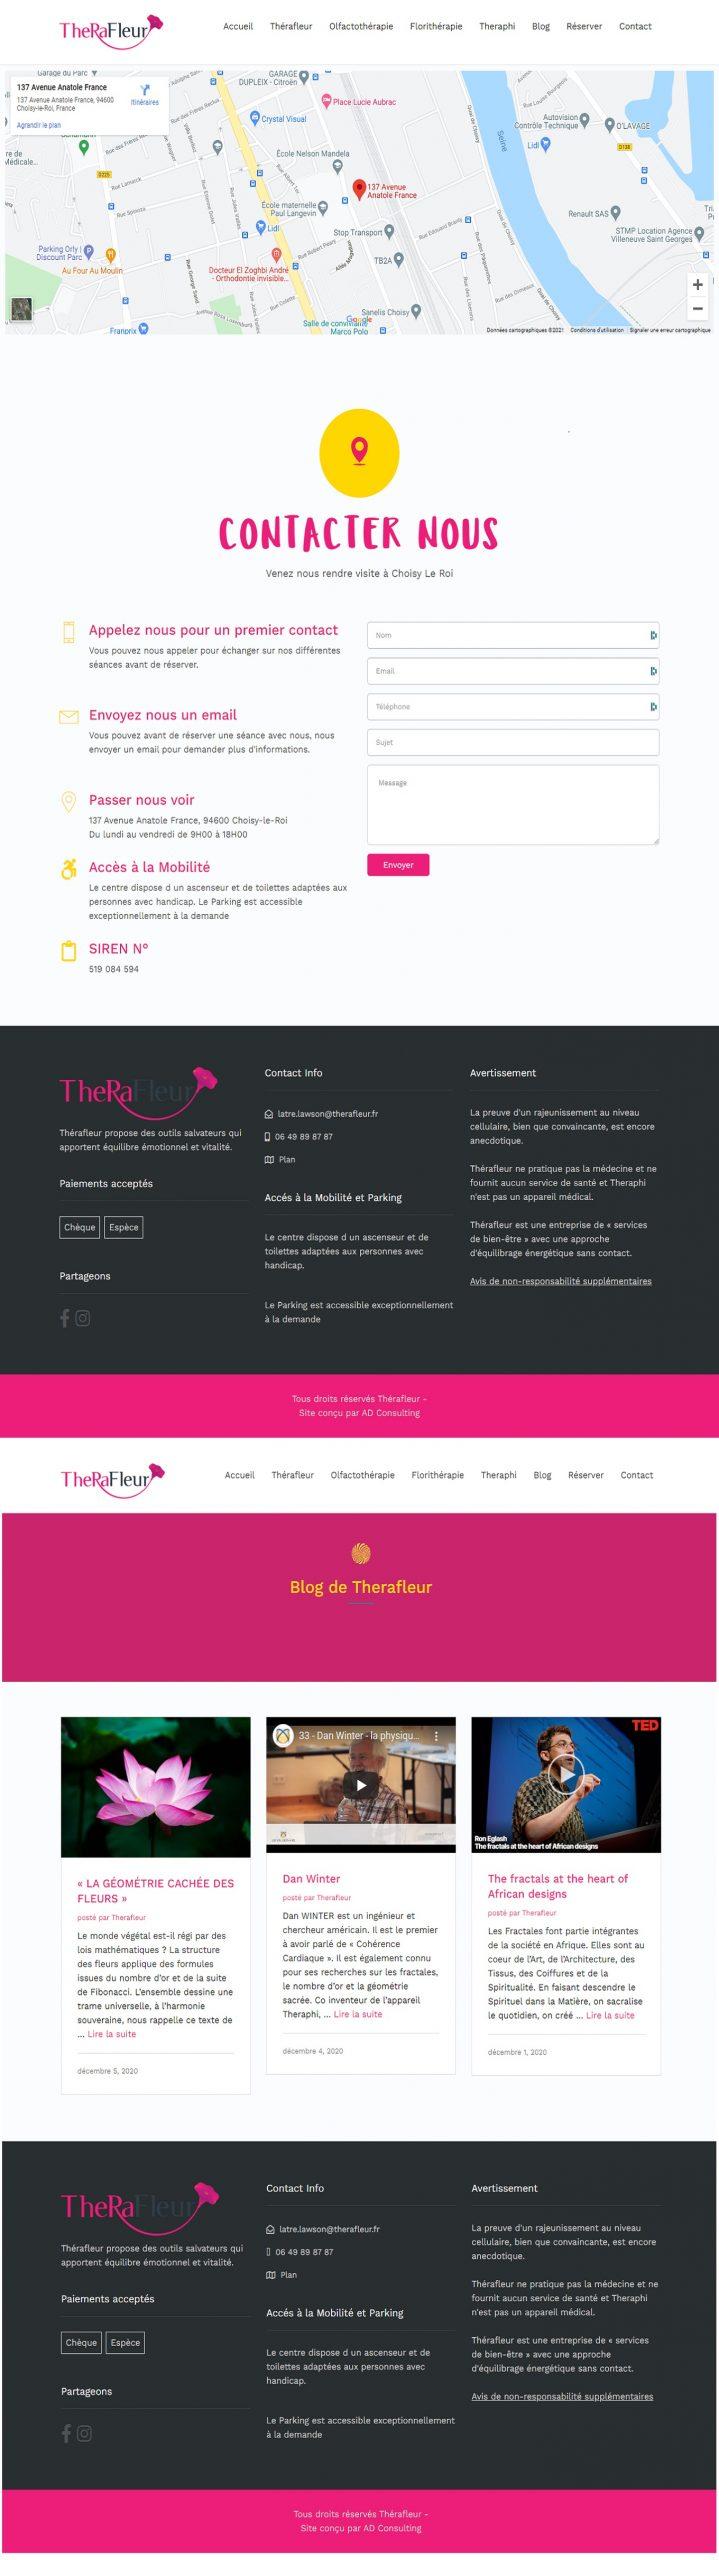 Therafleur Contact et Blog